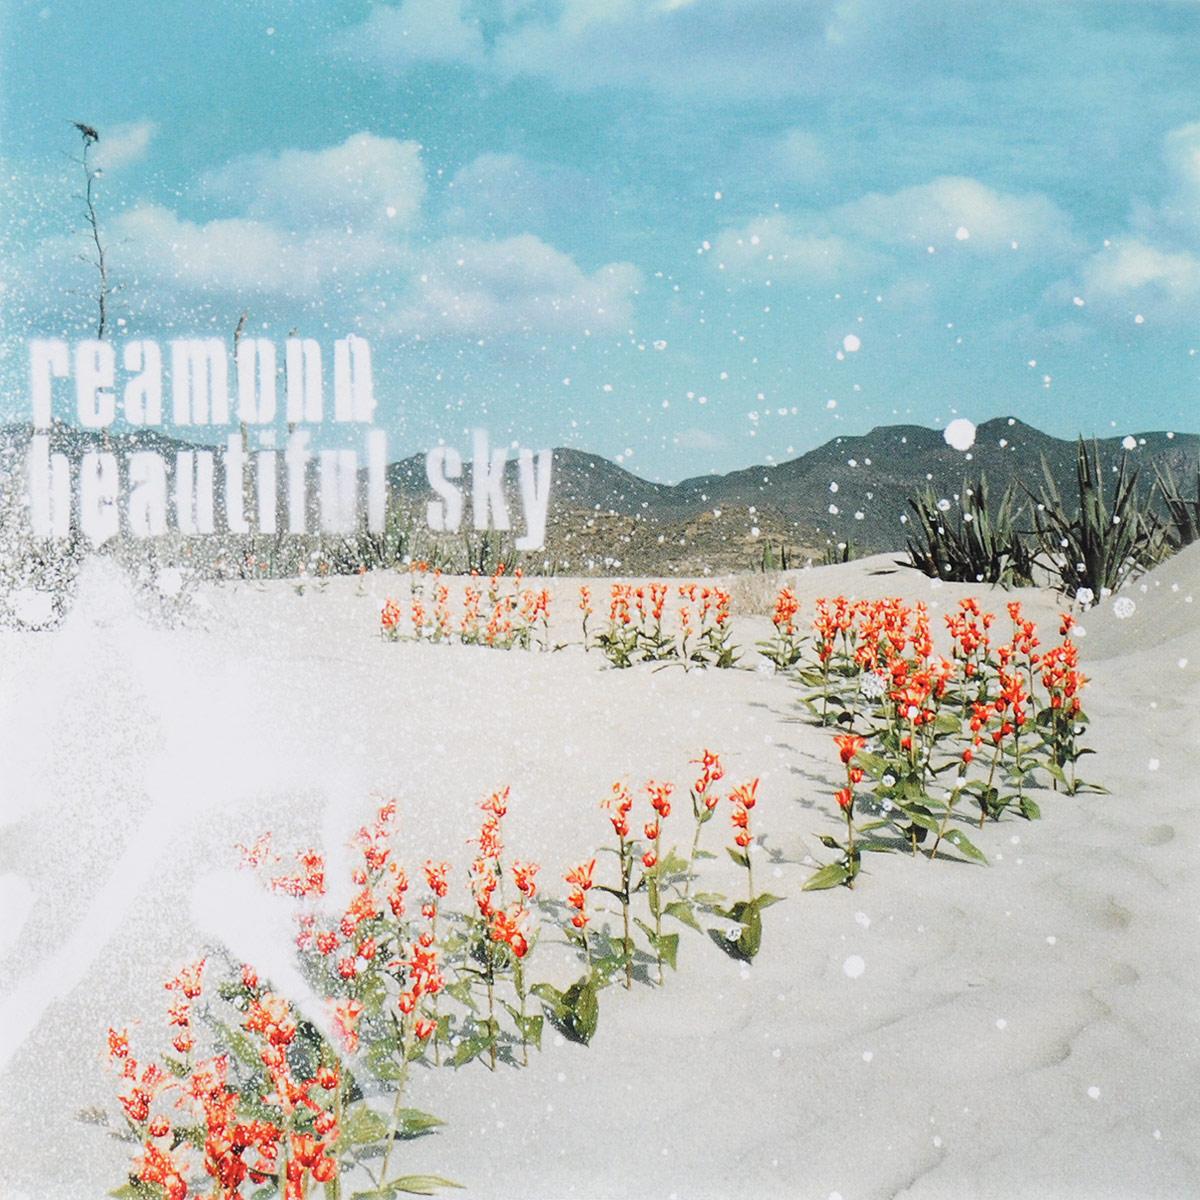 Reamonn REAMONN. BEAUTIFUL SKY dedo mg 34 high notes music files folder beautiful music files folder sky blue